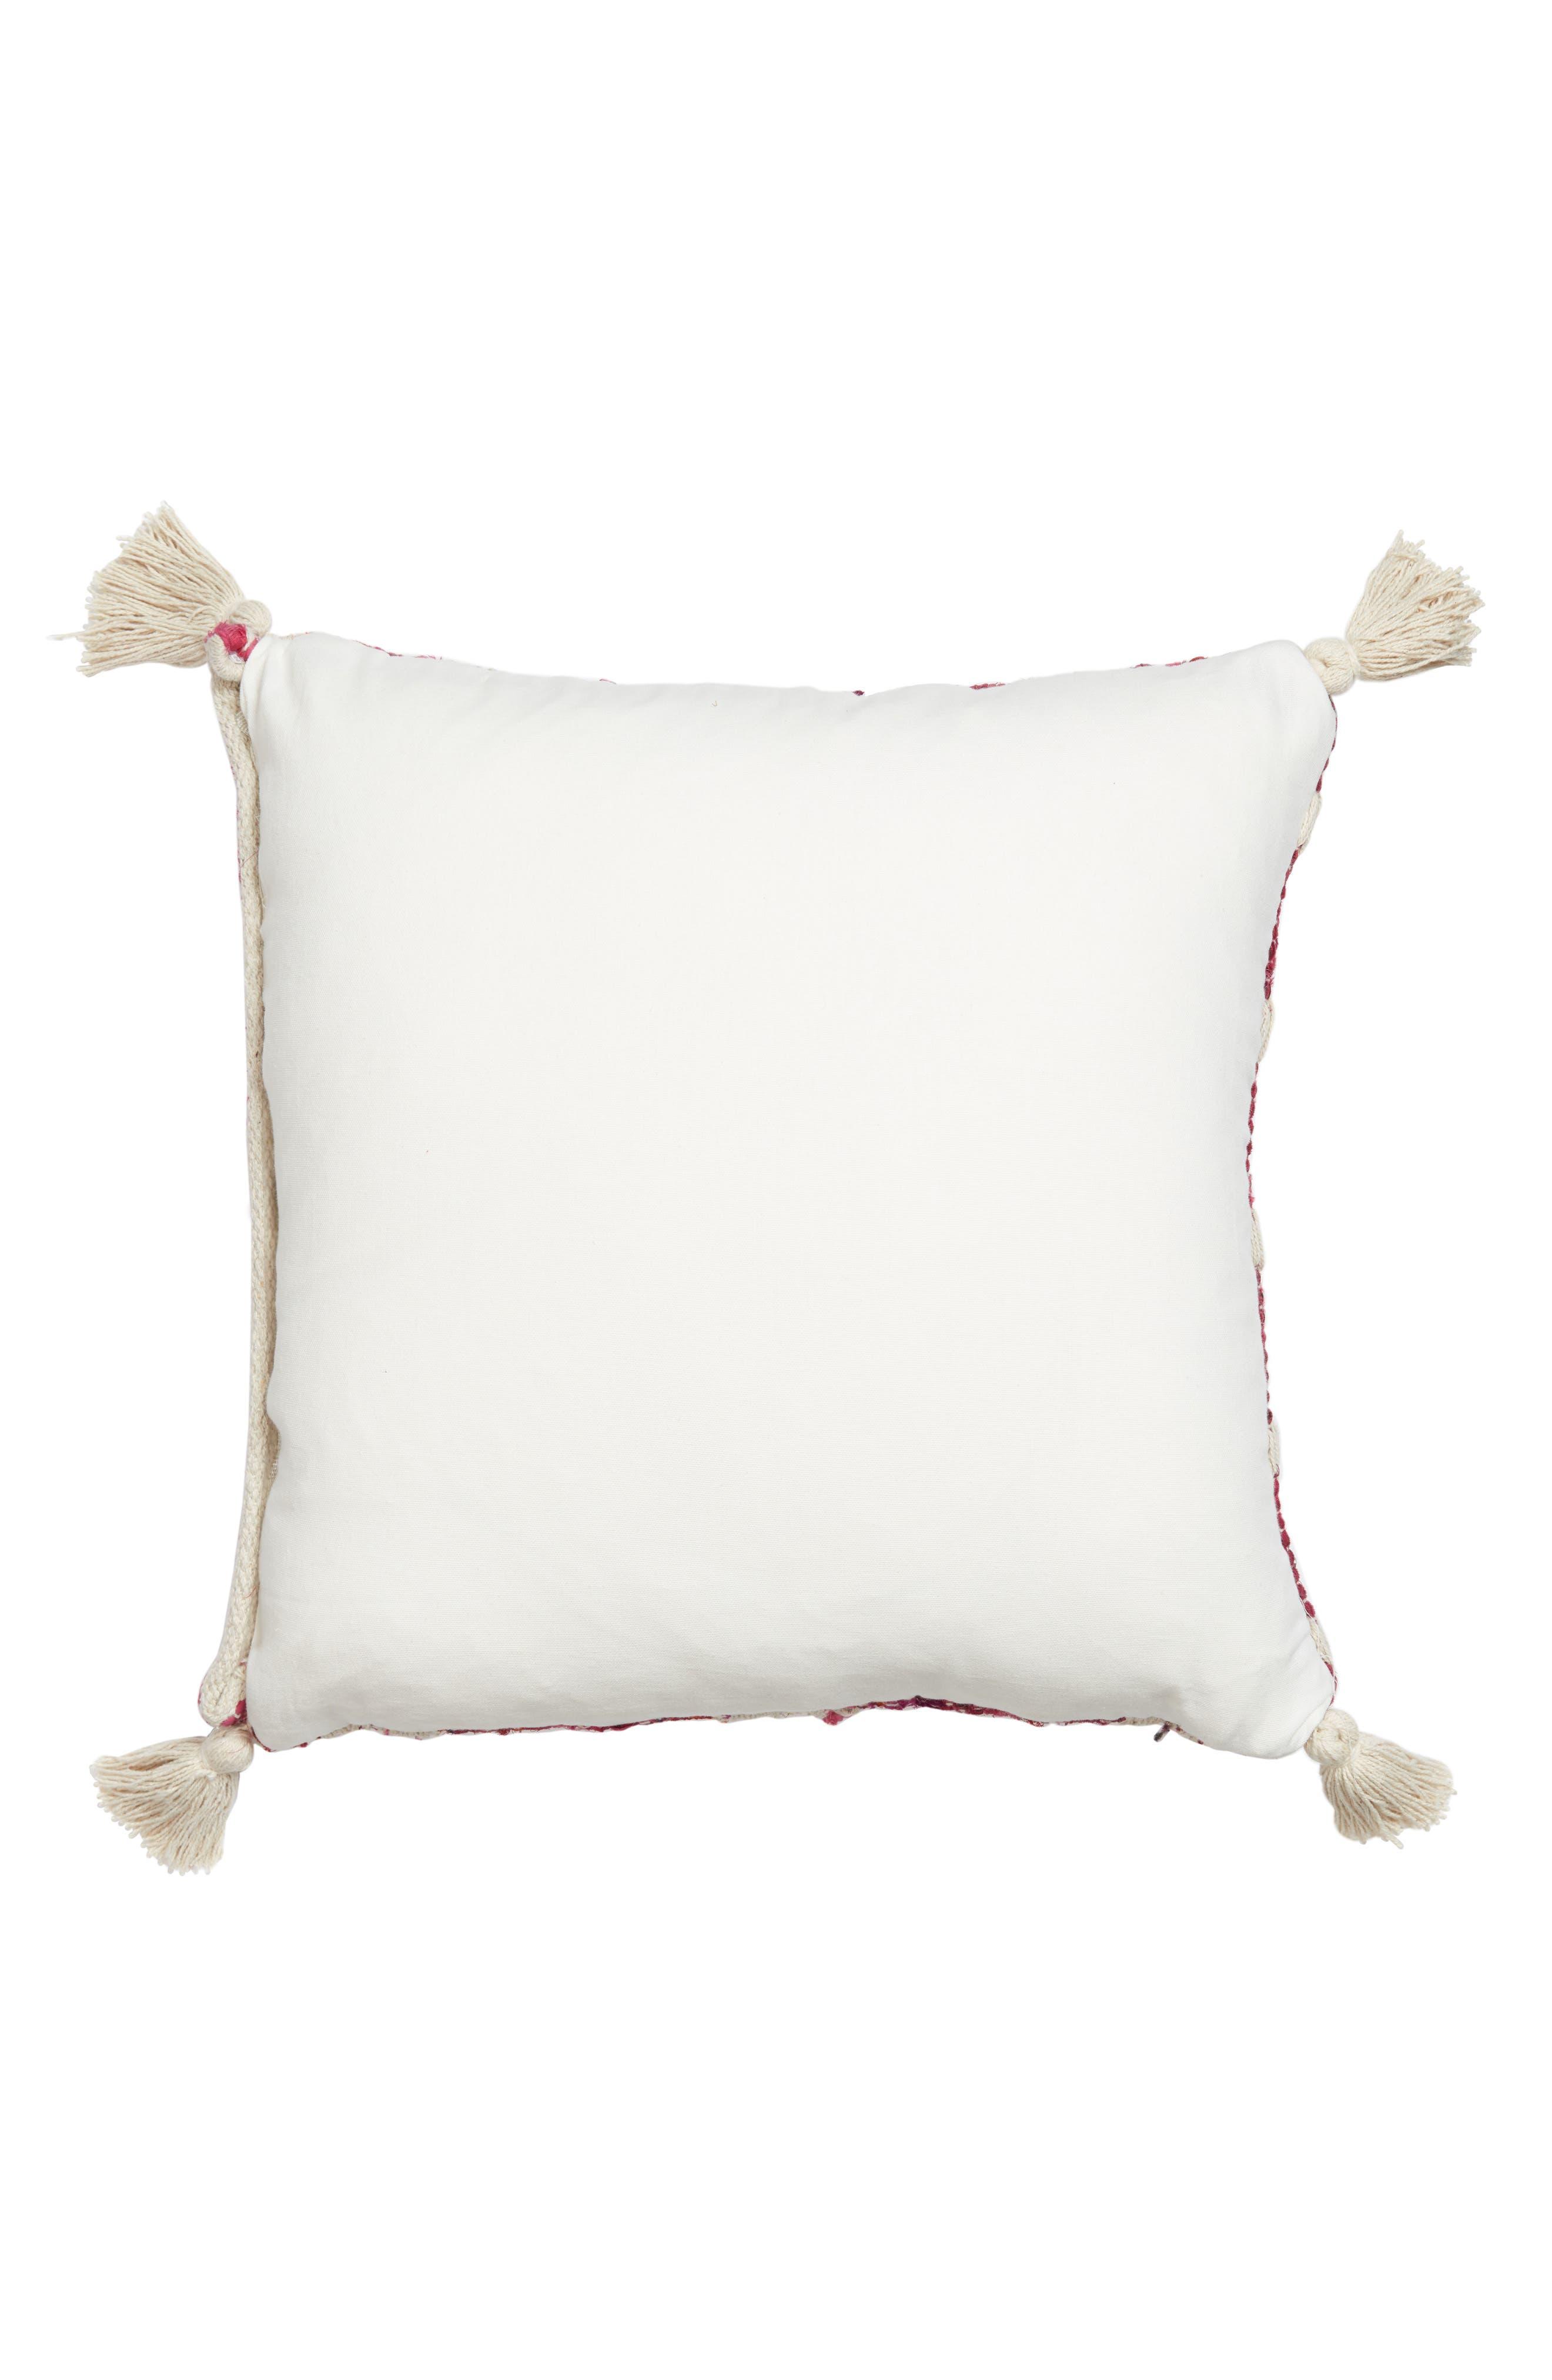 Diamond Chindi Accent Pillow,                             Alternate thumbnail 2, color,                             Hot Pink